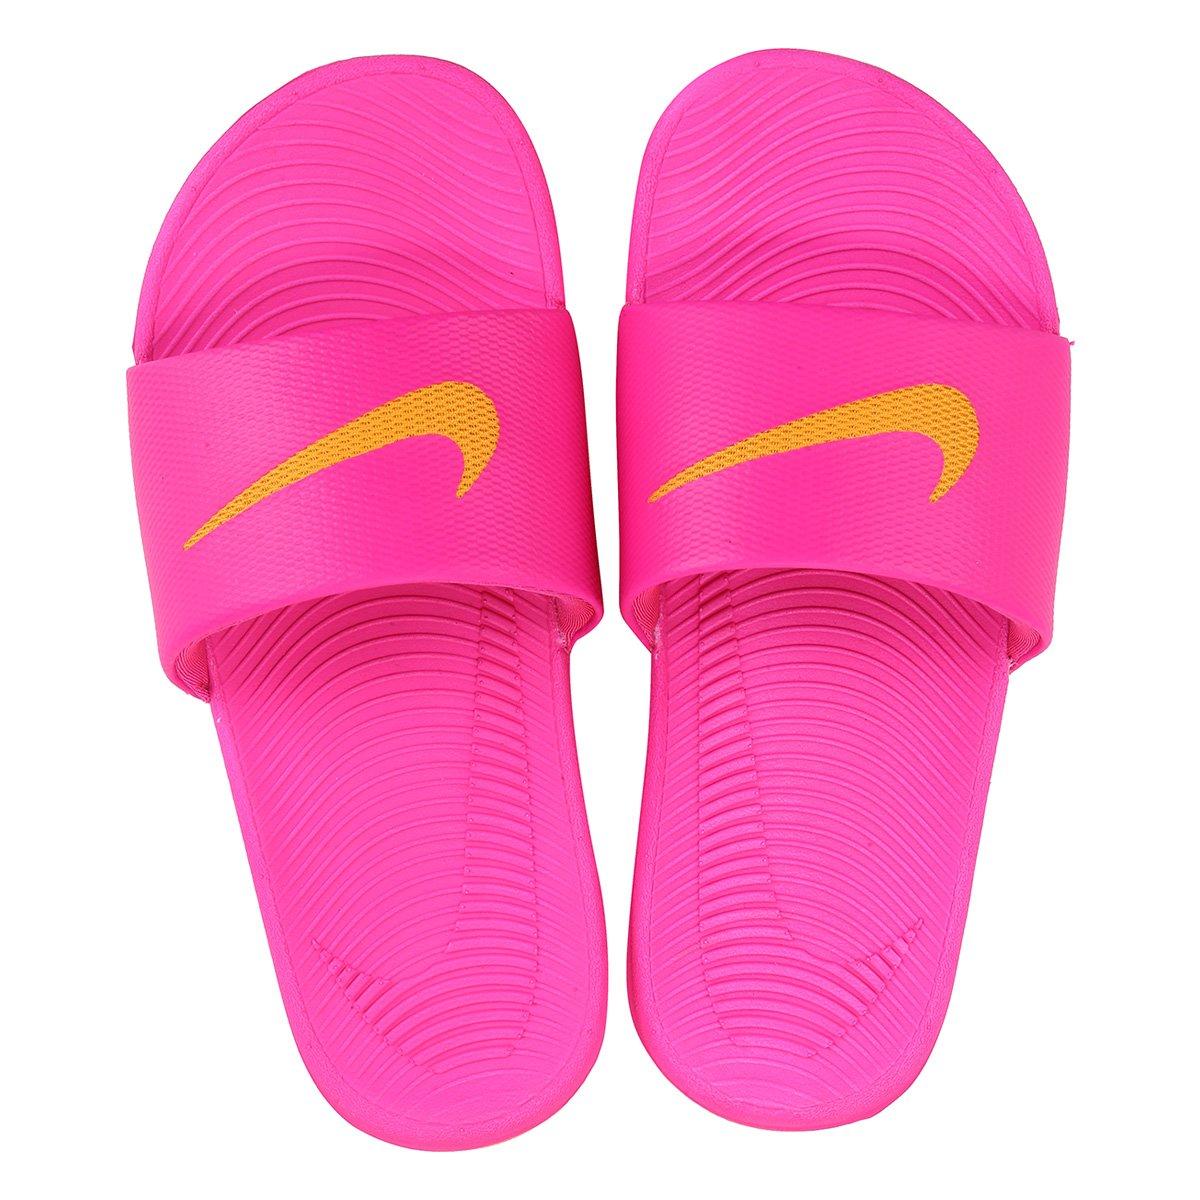 bb853d6544 Sandália Nike Kawa Slide Feminina - Pink e Laranja - Compre Agora ...